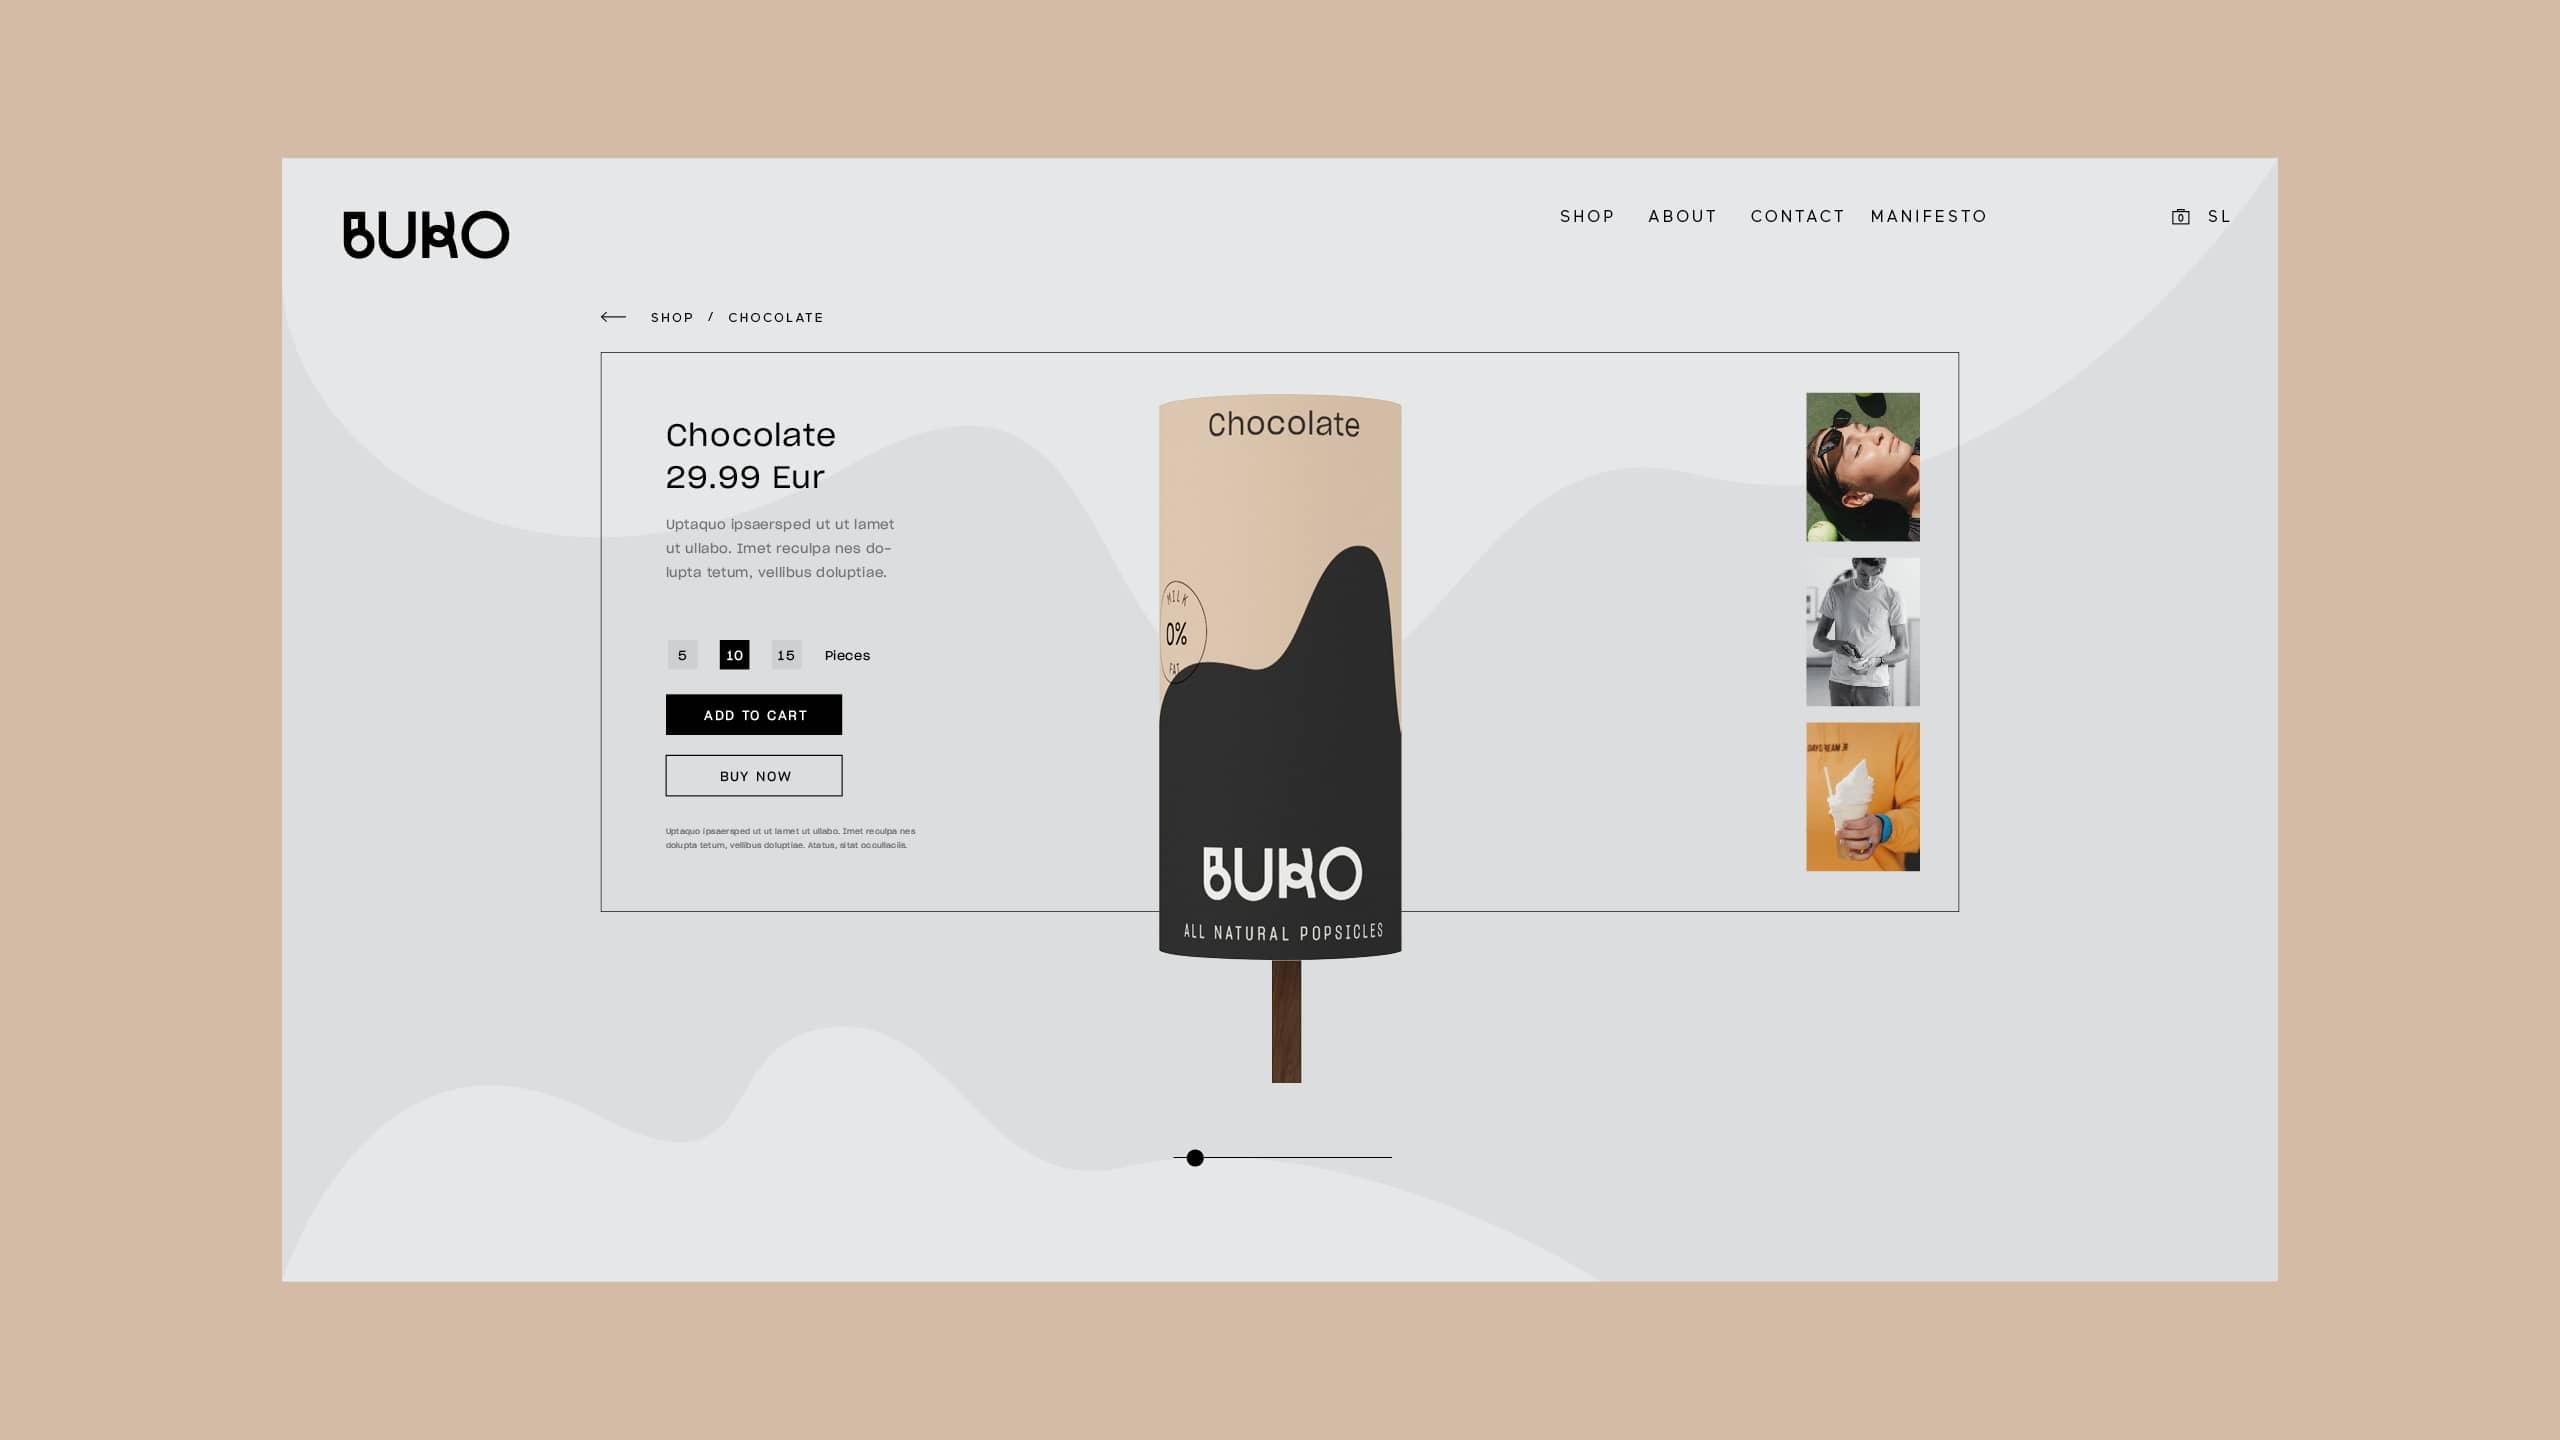 mantik-digital-creative-agency-branding-popsicle-icecream-packaging-experience-web-design-development21-min